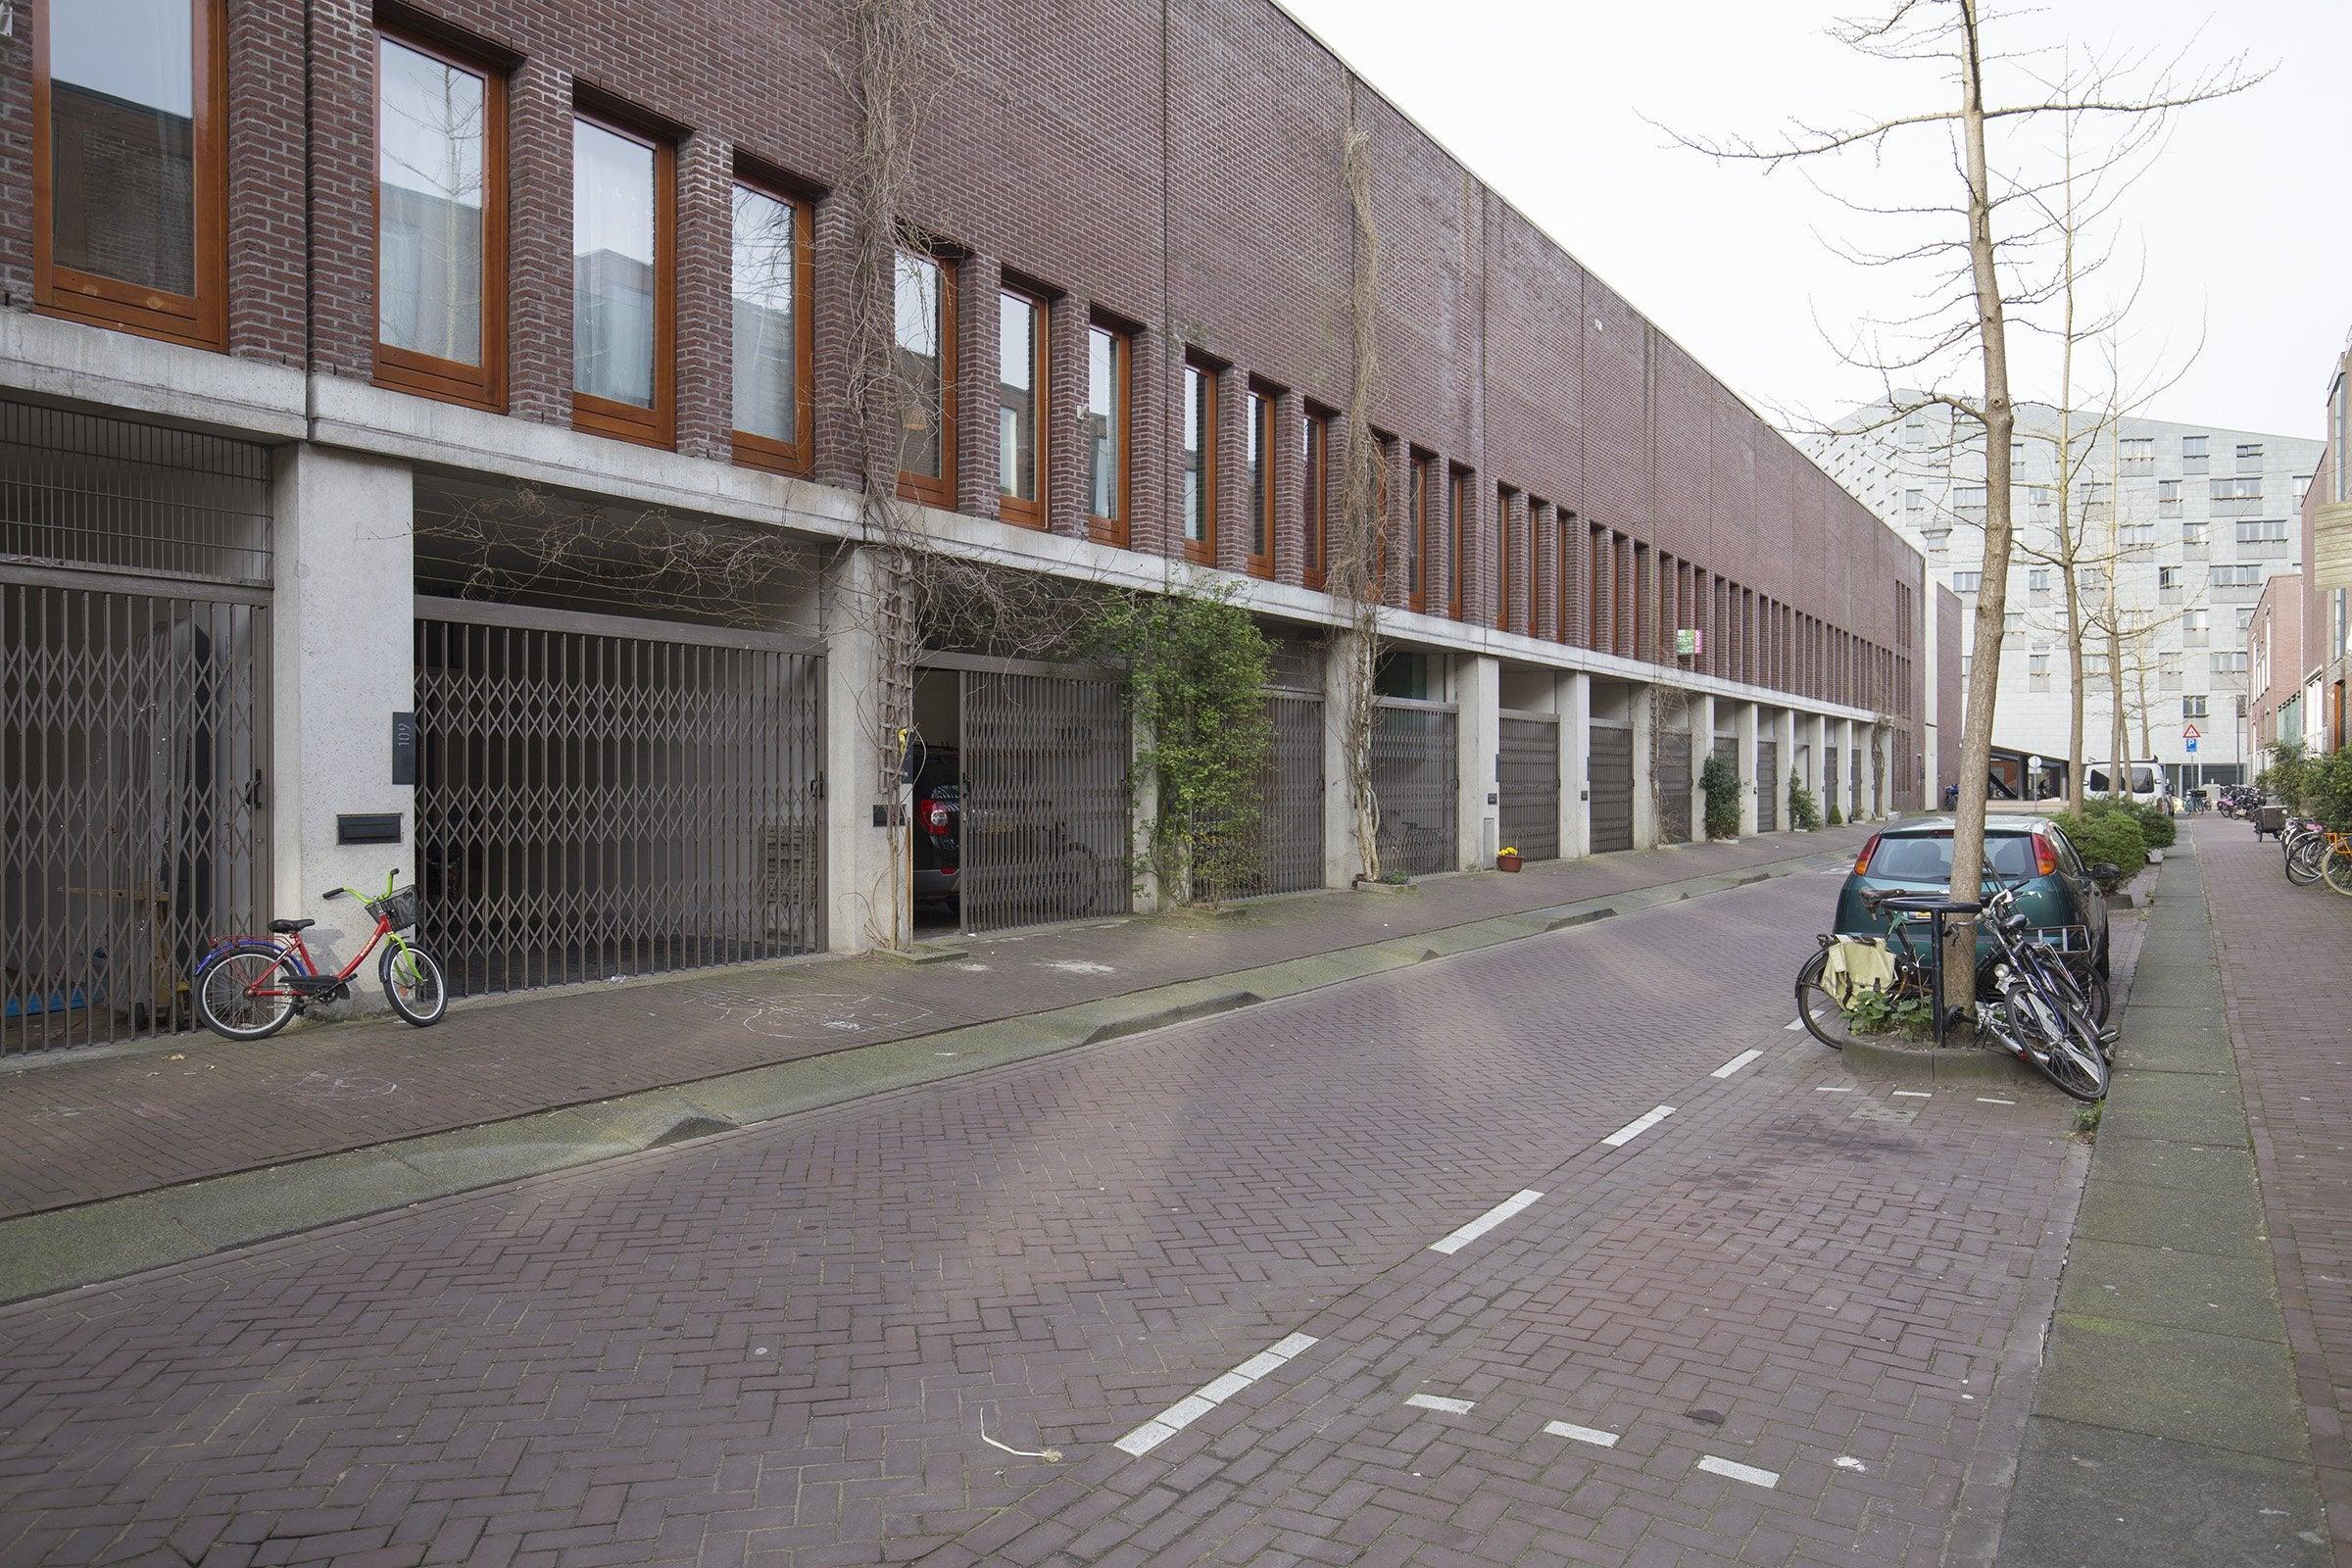 Lampenistenstraat